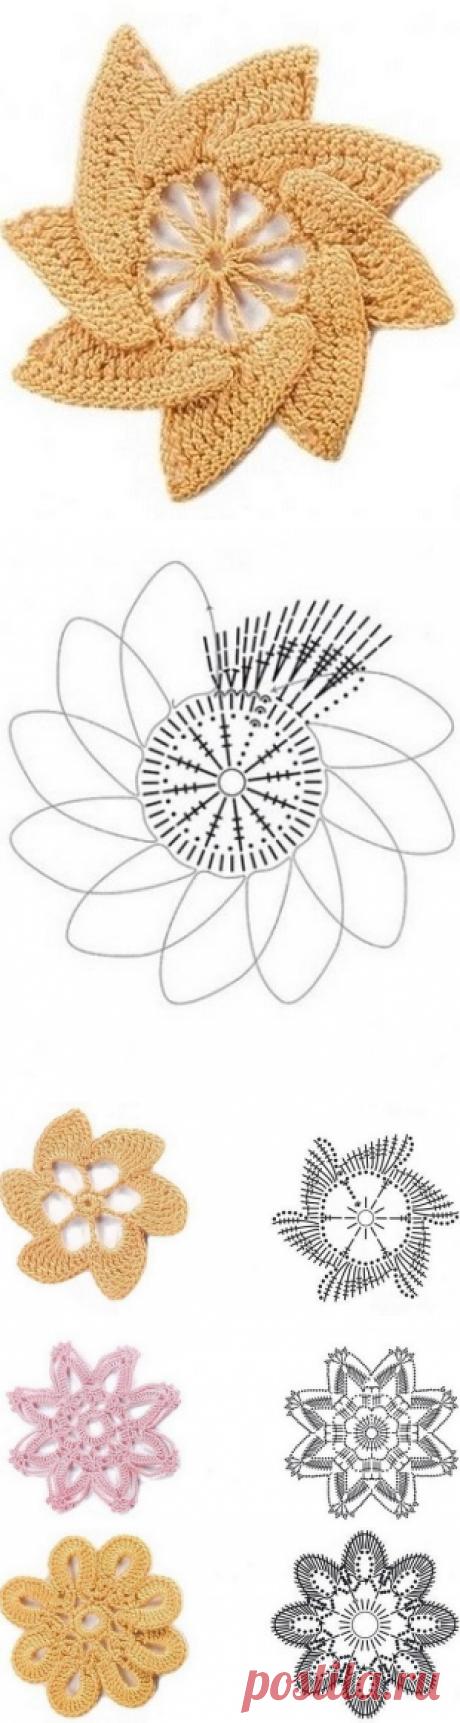 Schemes of flowers hook